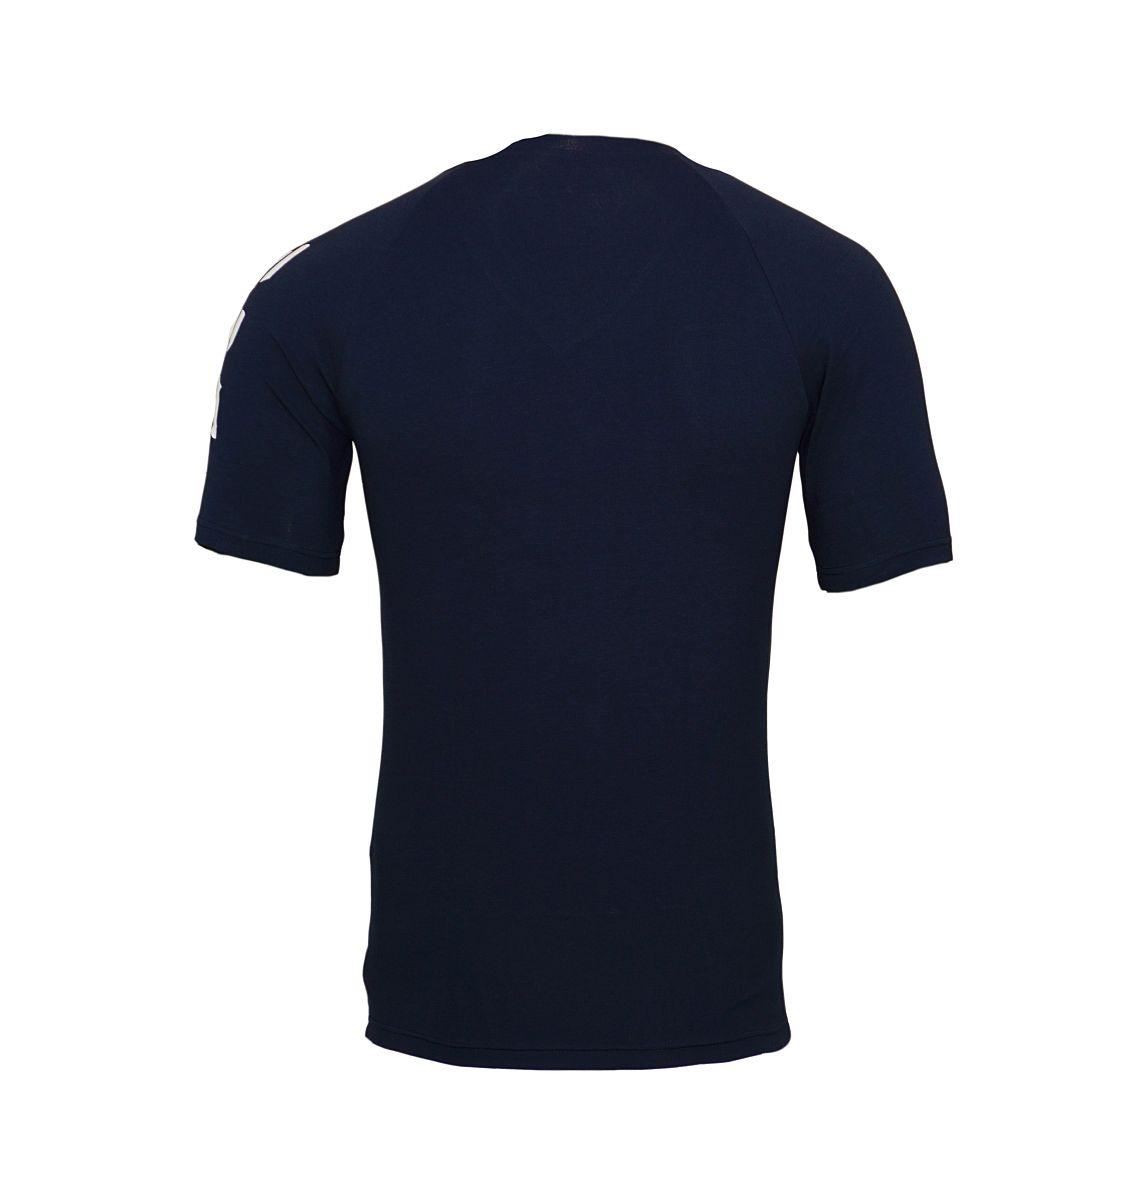 Emporio Armani T-Shirts V-Ausschnitt 111760 8P725 00135 MARINE W18-EATS1